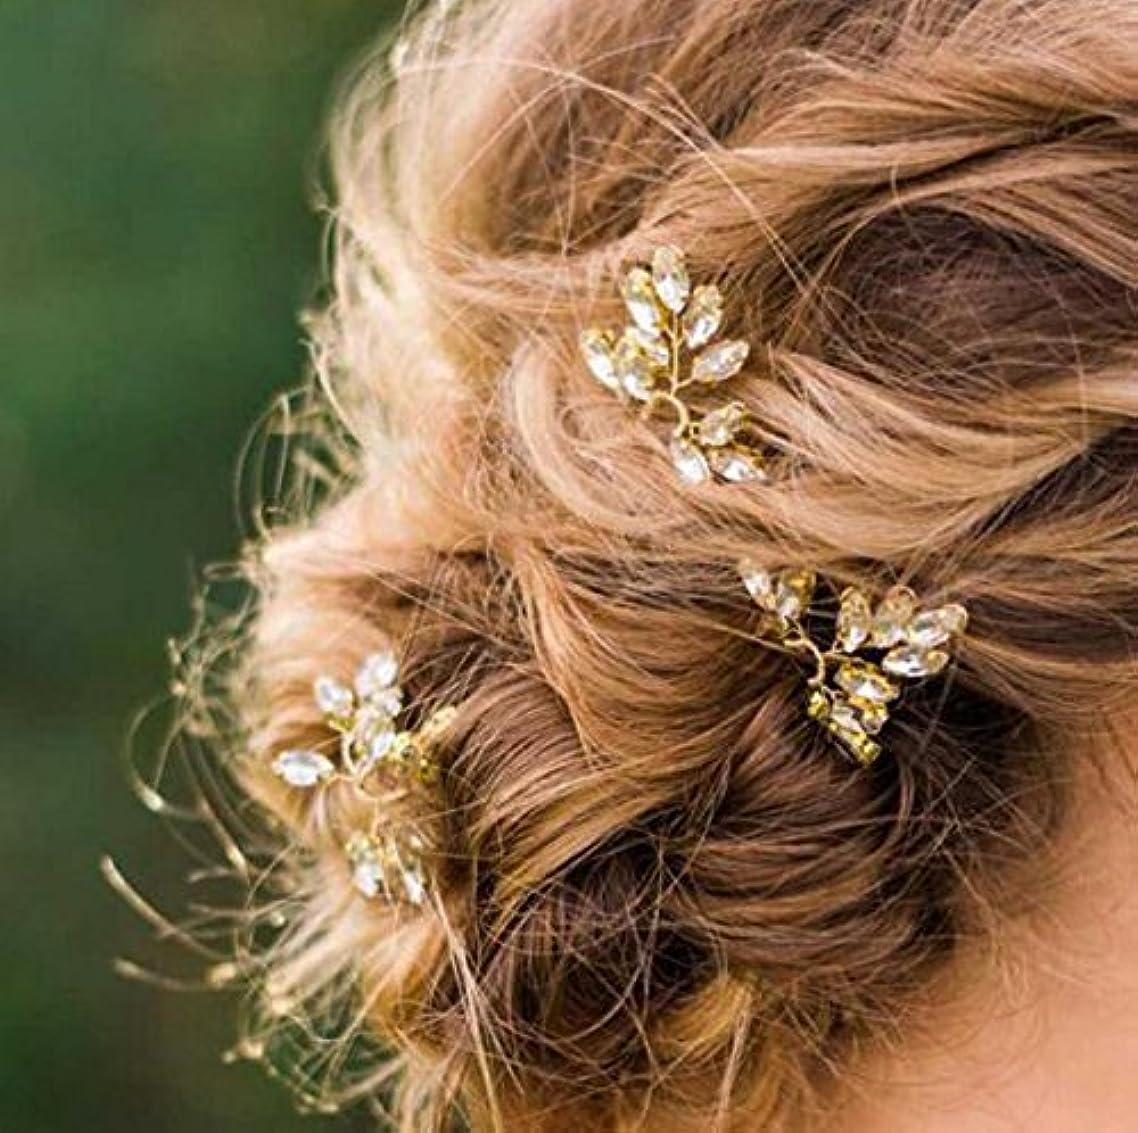 Yean Bridal Hair Pins Set Wedding Rhinestones Bead Hair Pin for Women and Girls (Set of 3) (Gold)